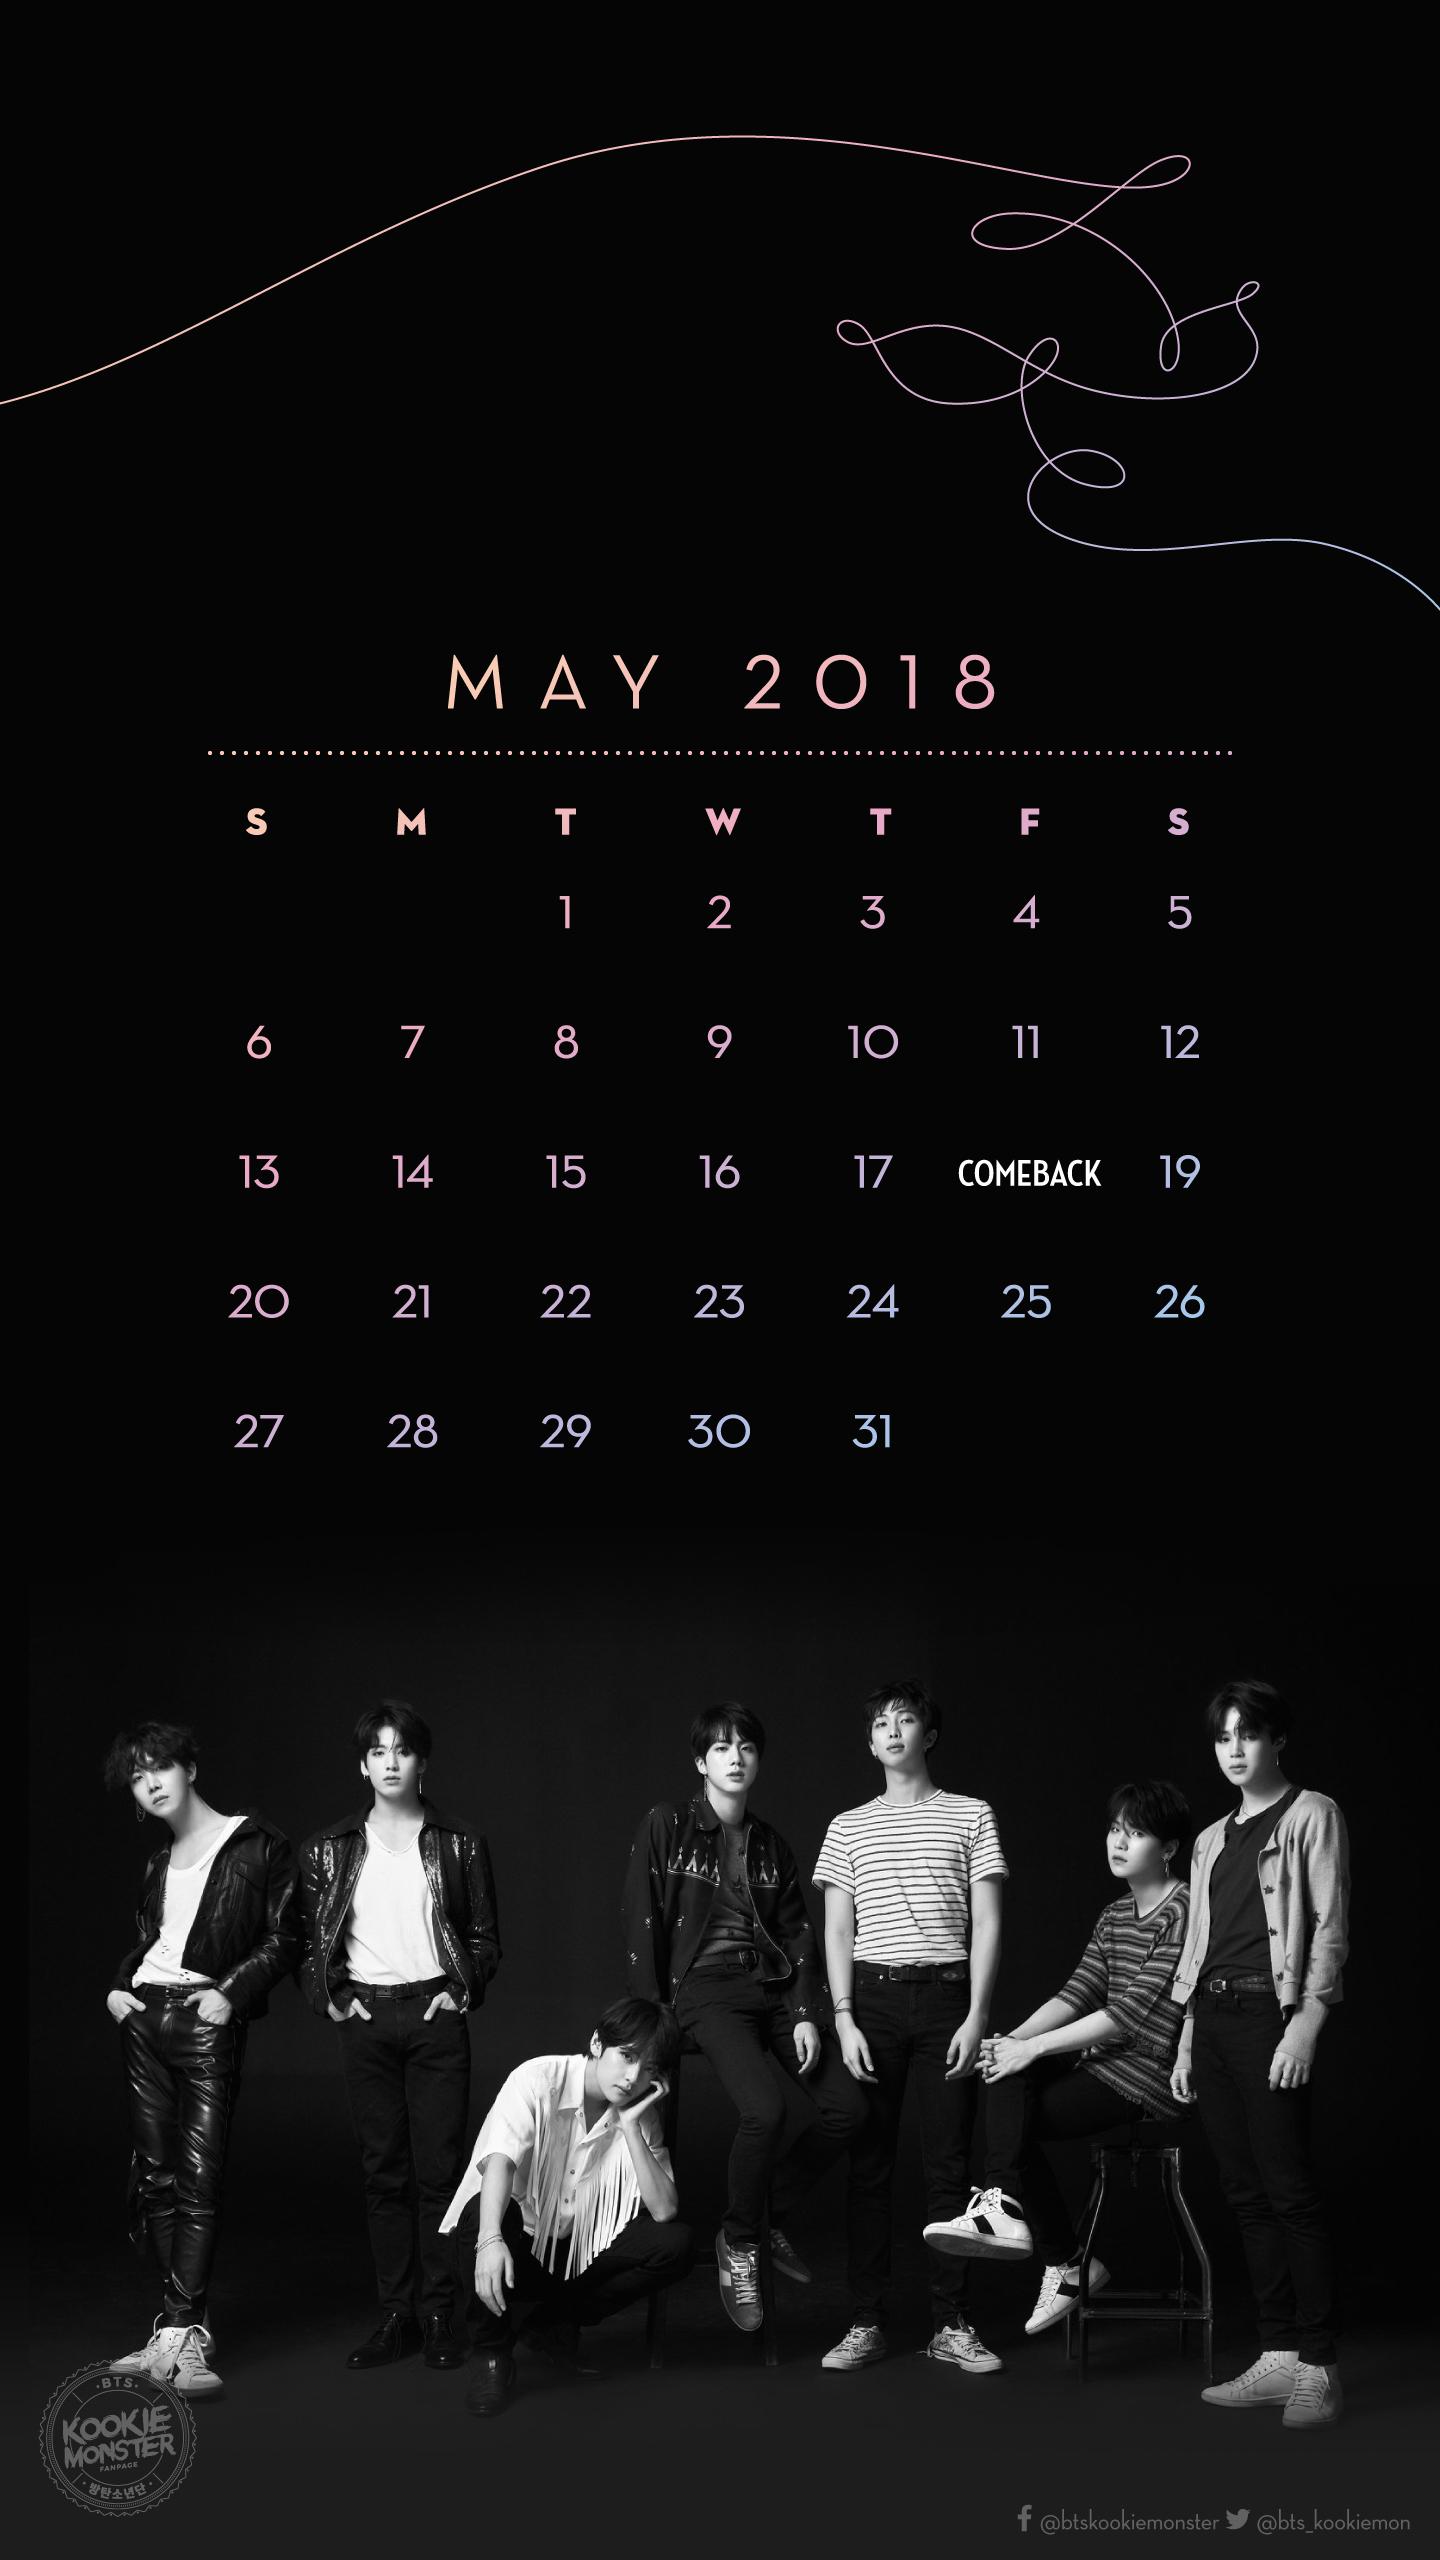 05 Calendar Wallpaper 2018 Bts Kookie Monster